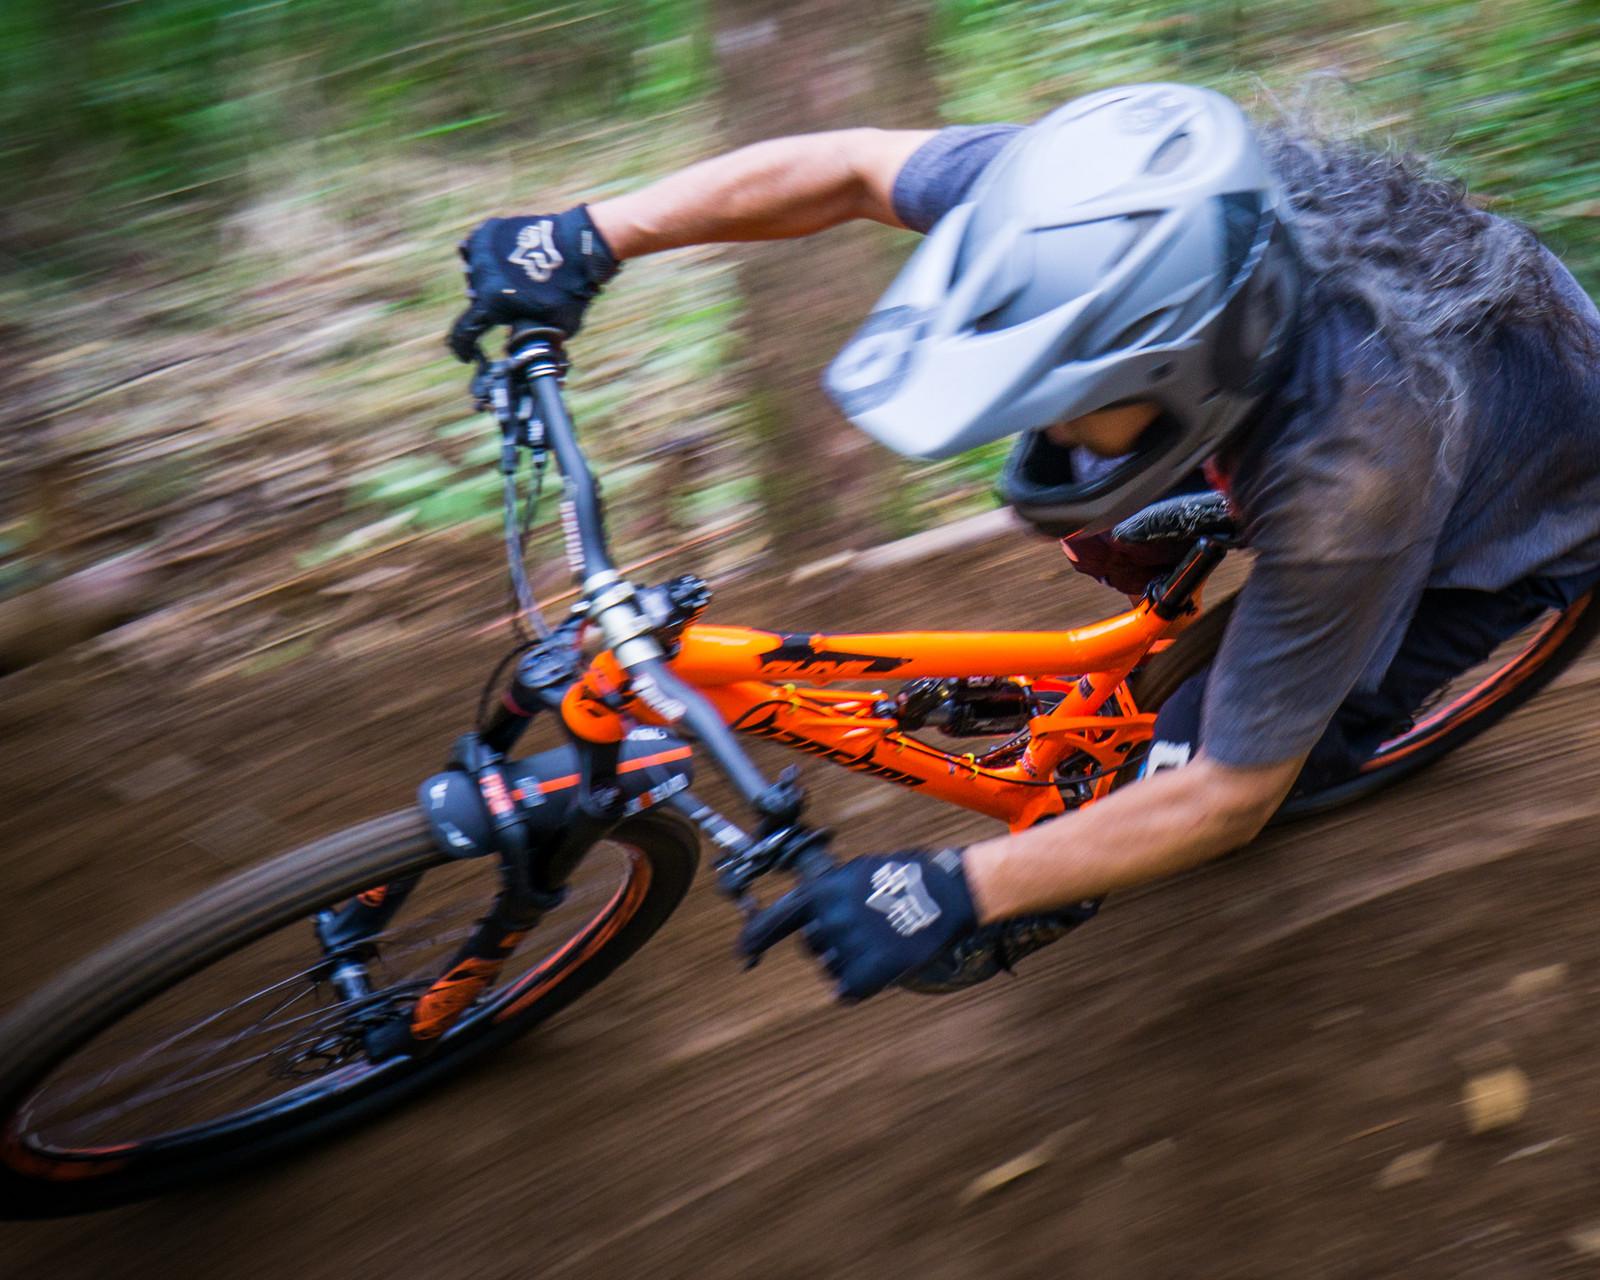 Danimal Berm - FatNutz - Mountain Biking Pictures - Vital MTB